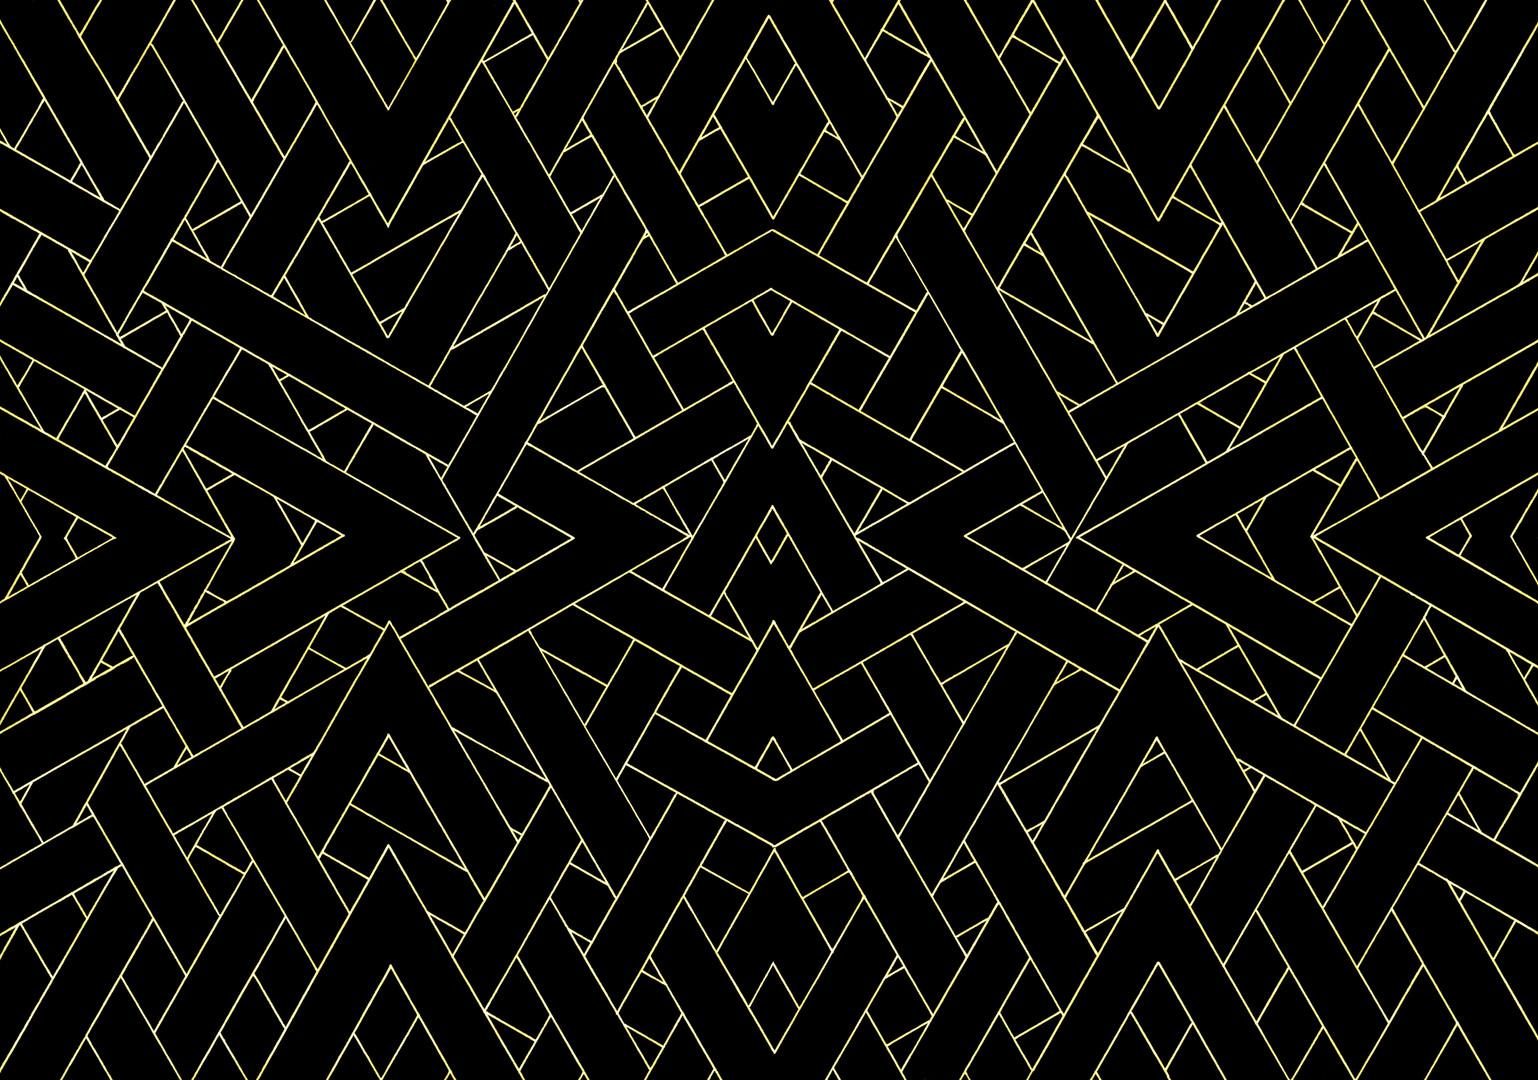 Art Deco # 8 'Golden Shards' illustration